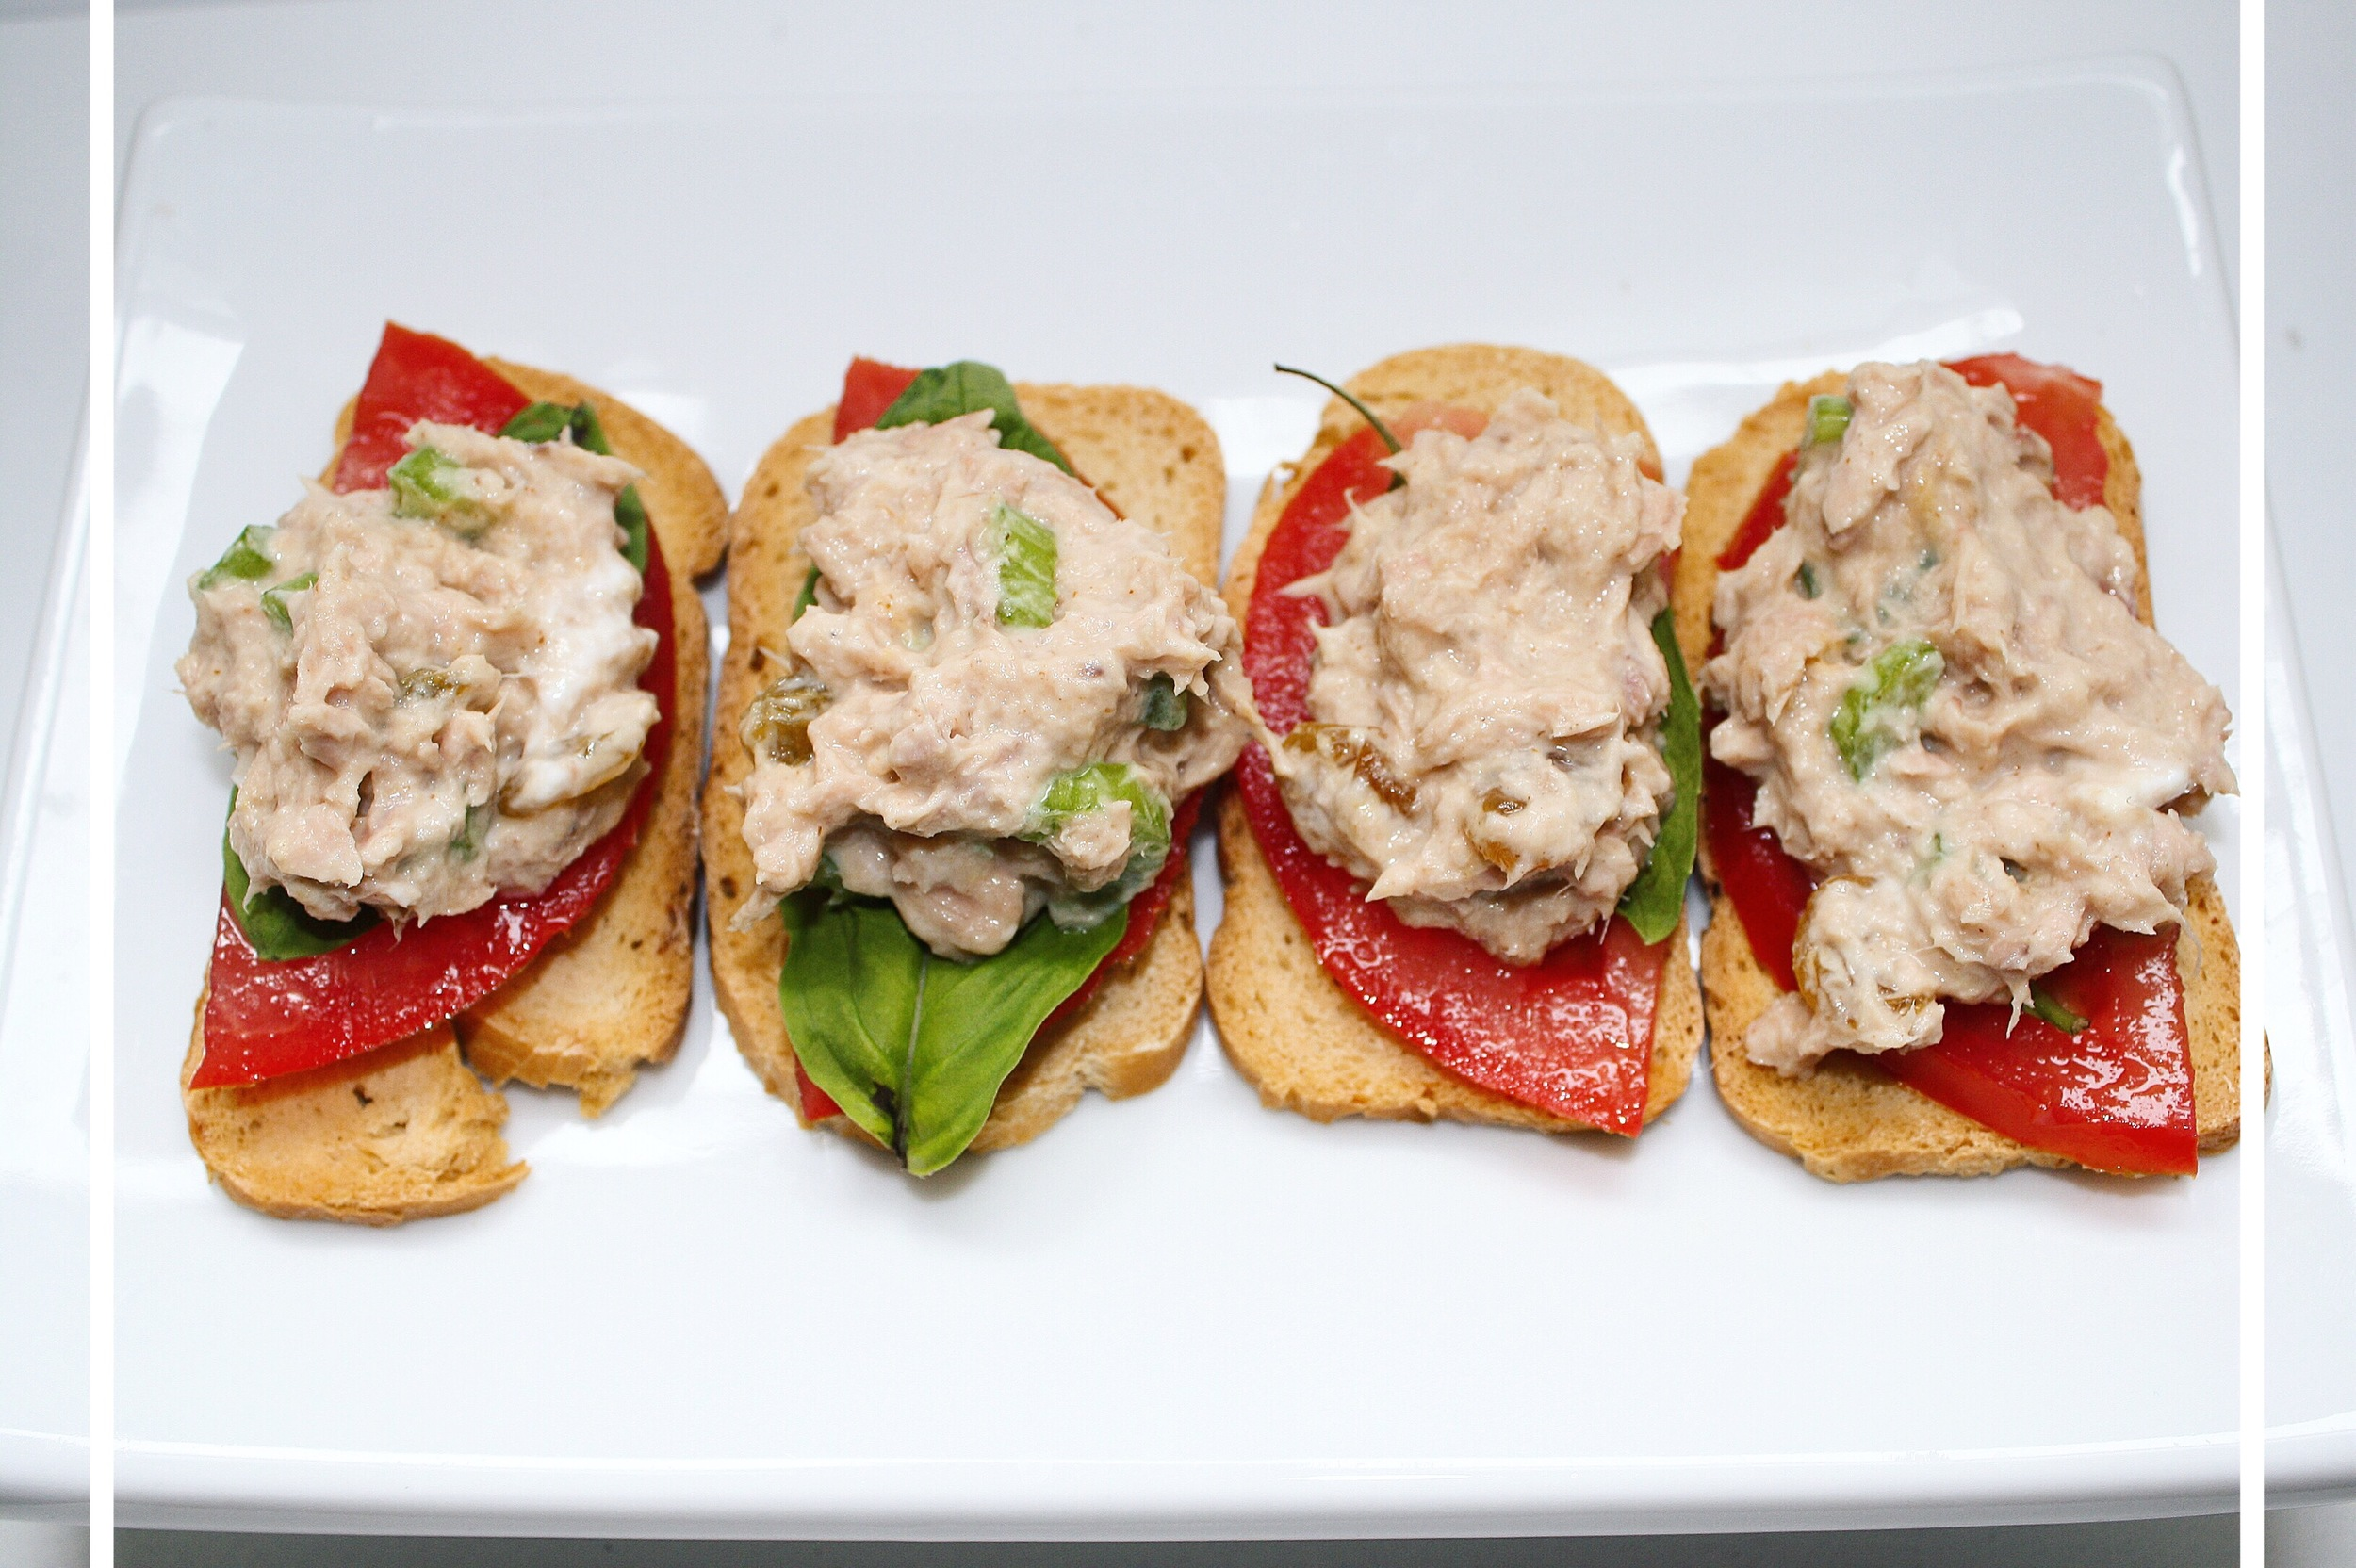 I hosted a cracker potluck and made these tomato, basil, tuna salad crostini!